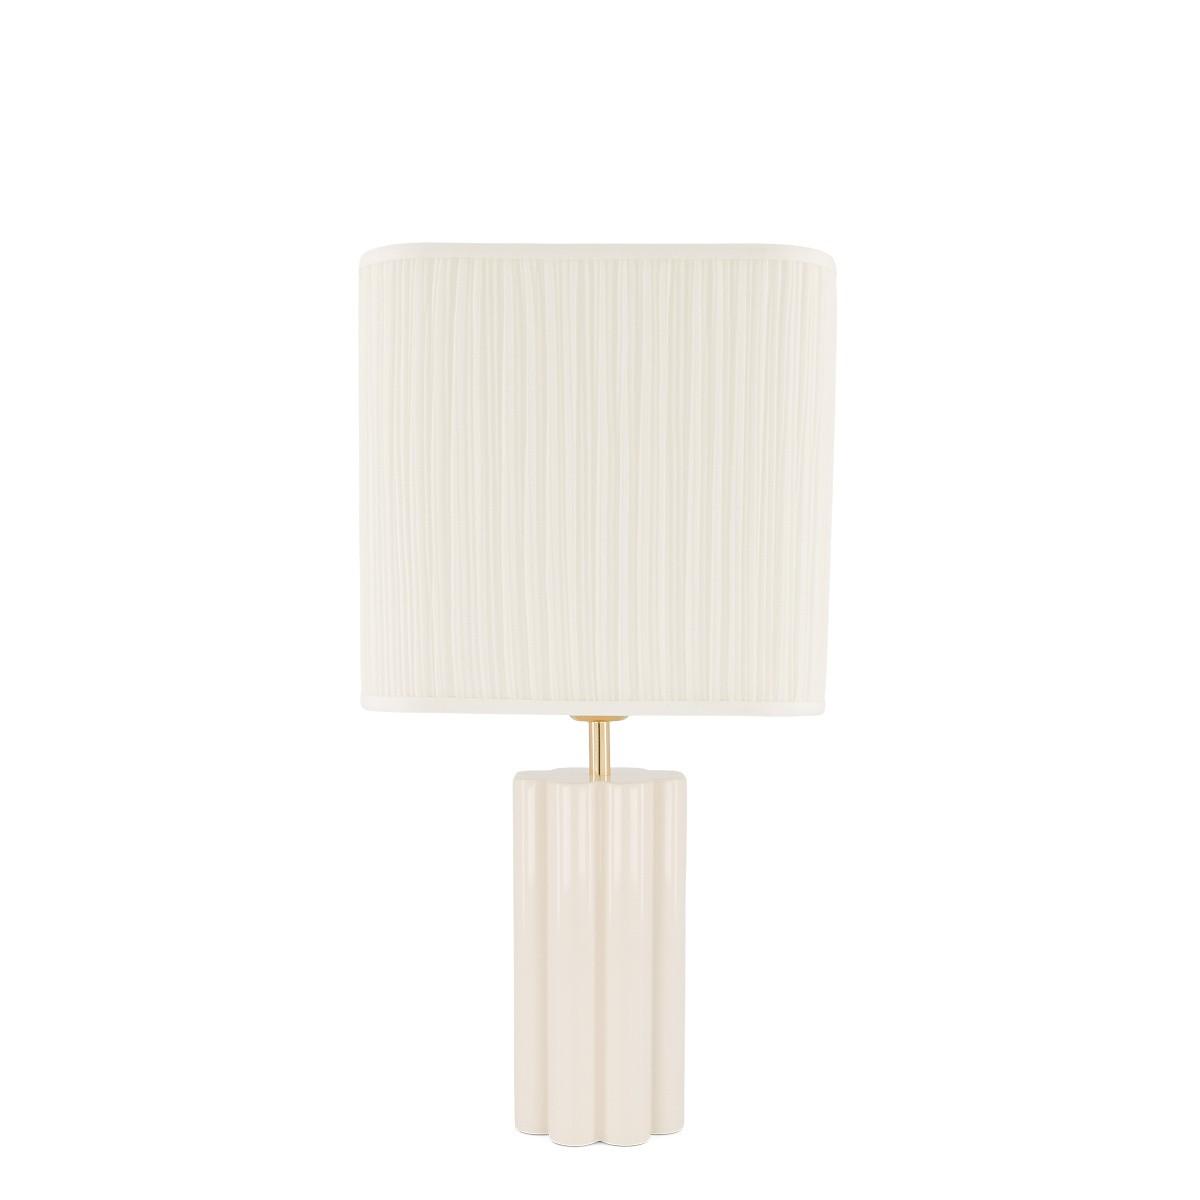 Petite lampe à poser Gioia blanc crème